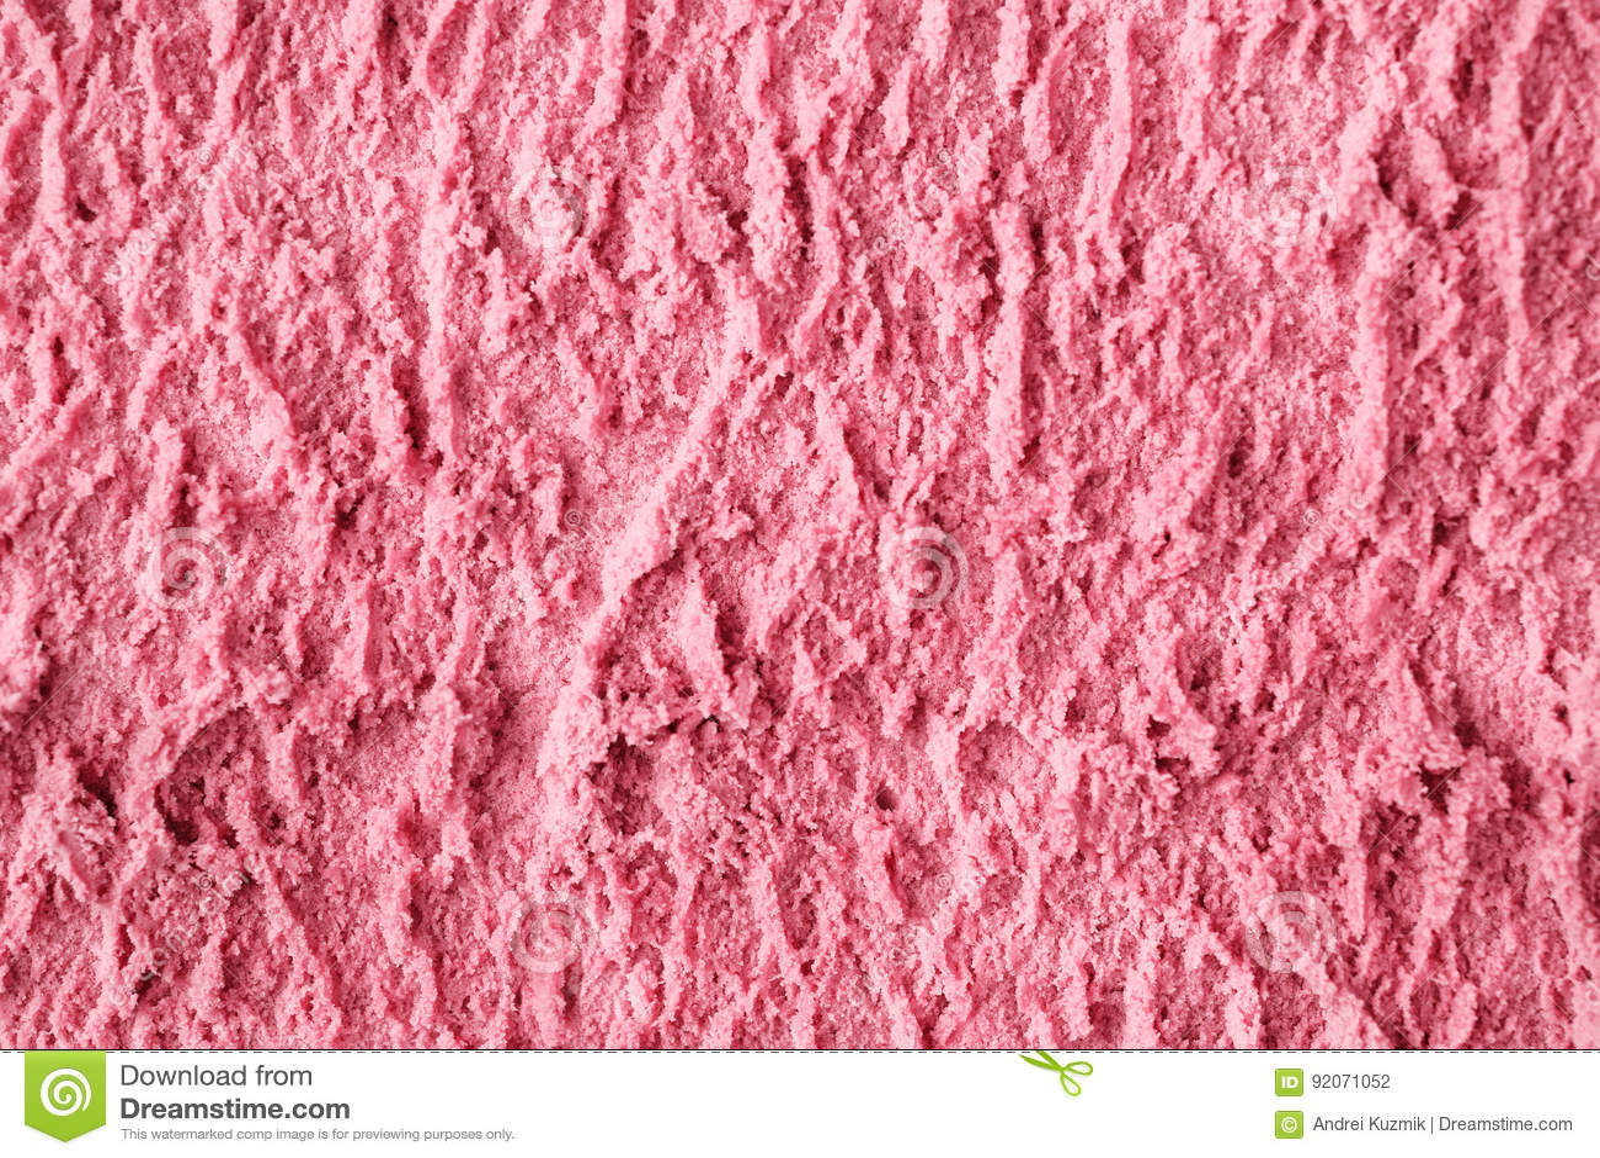 Cream Texture Stock Images - Download 52,338 Photos